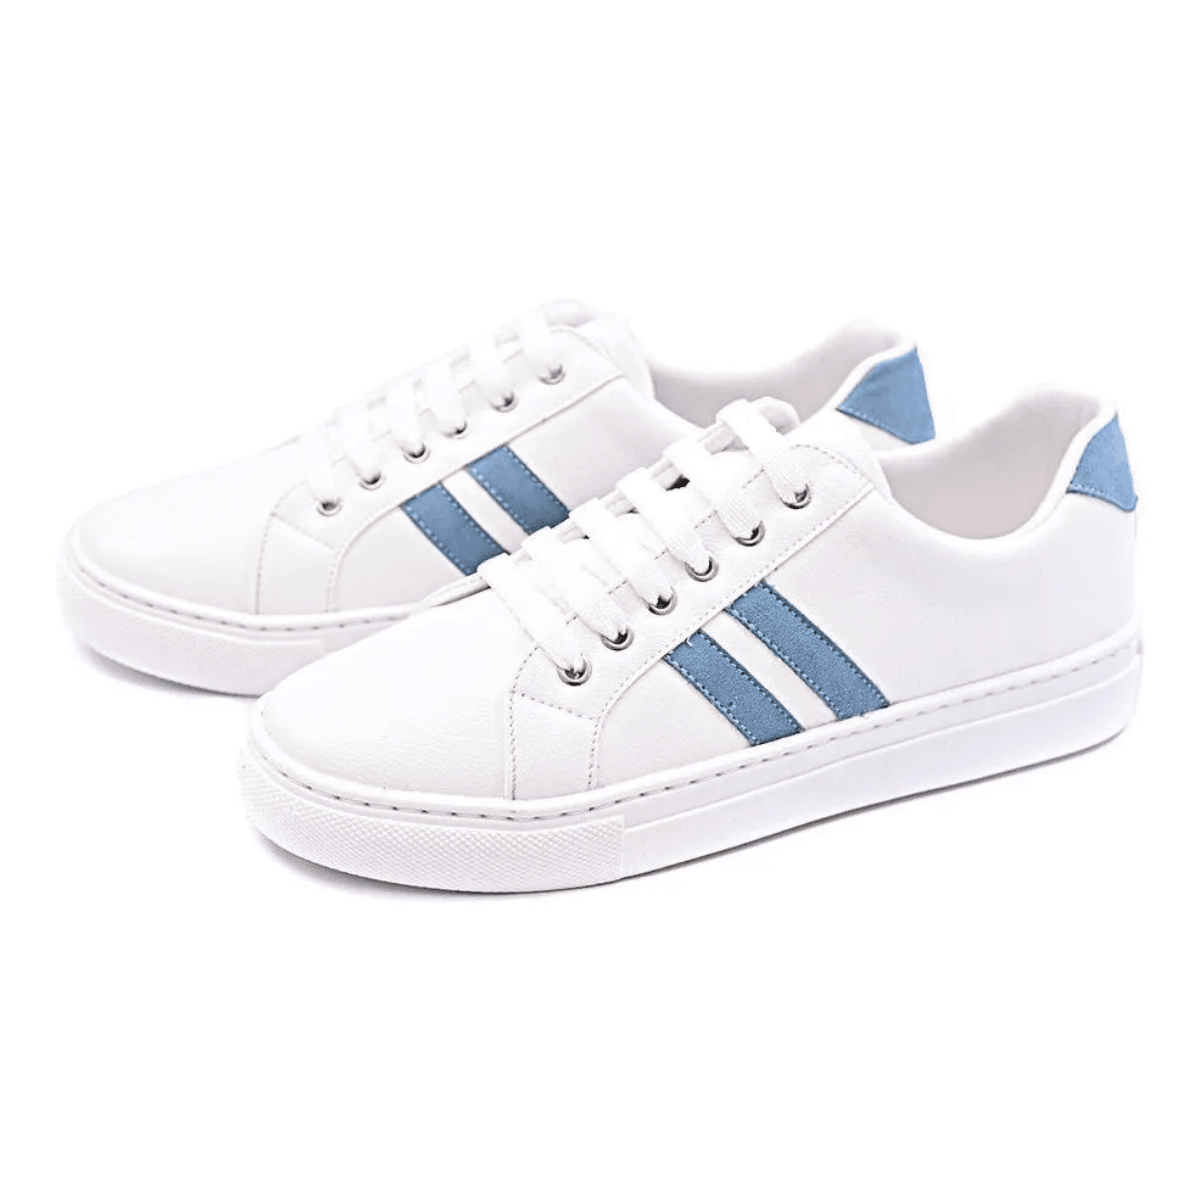 Tênis Casual Gommix Shoes 053 Listras Azul Ártico